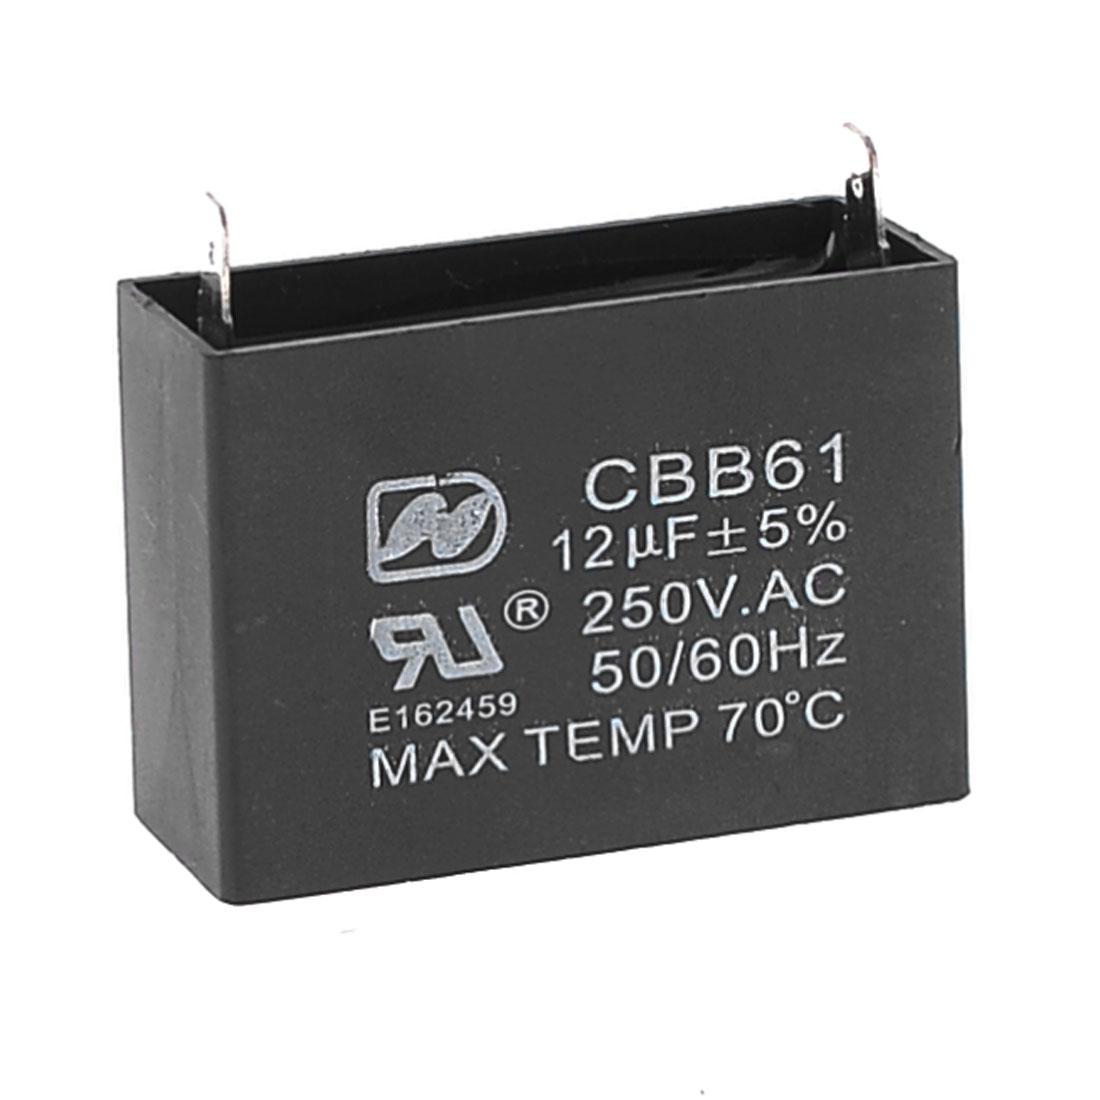 Black Metallized Polypropylene Running Capacitor 250VAC 12UF CBB61 50/60Hz